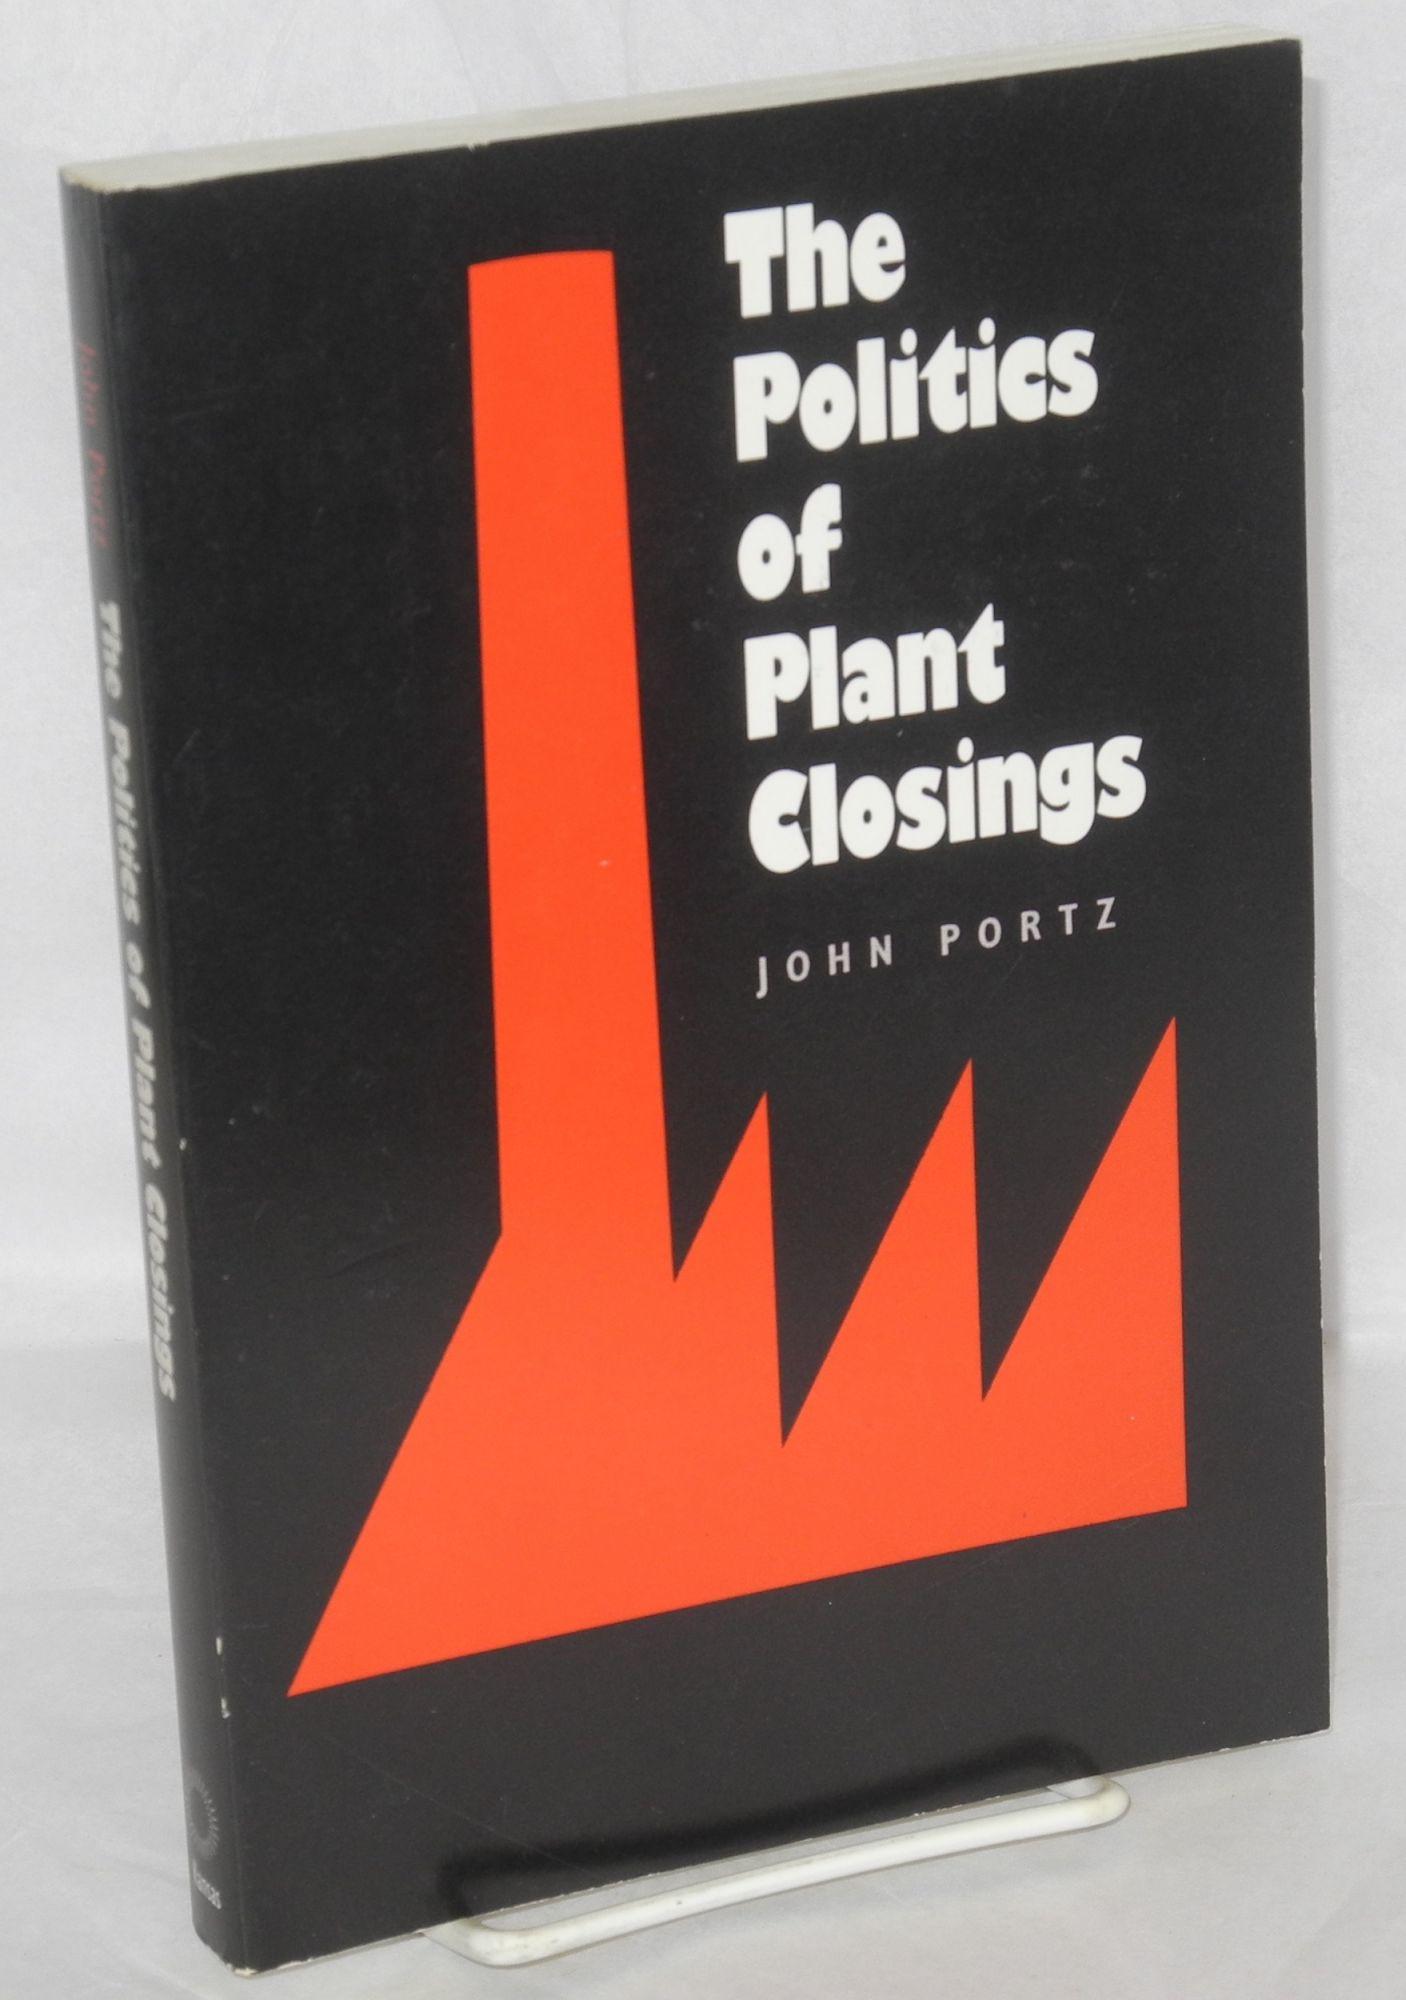 The politics of plant closings - Portz, John